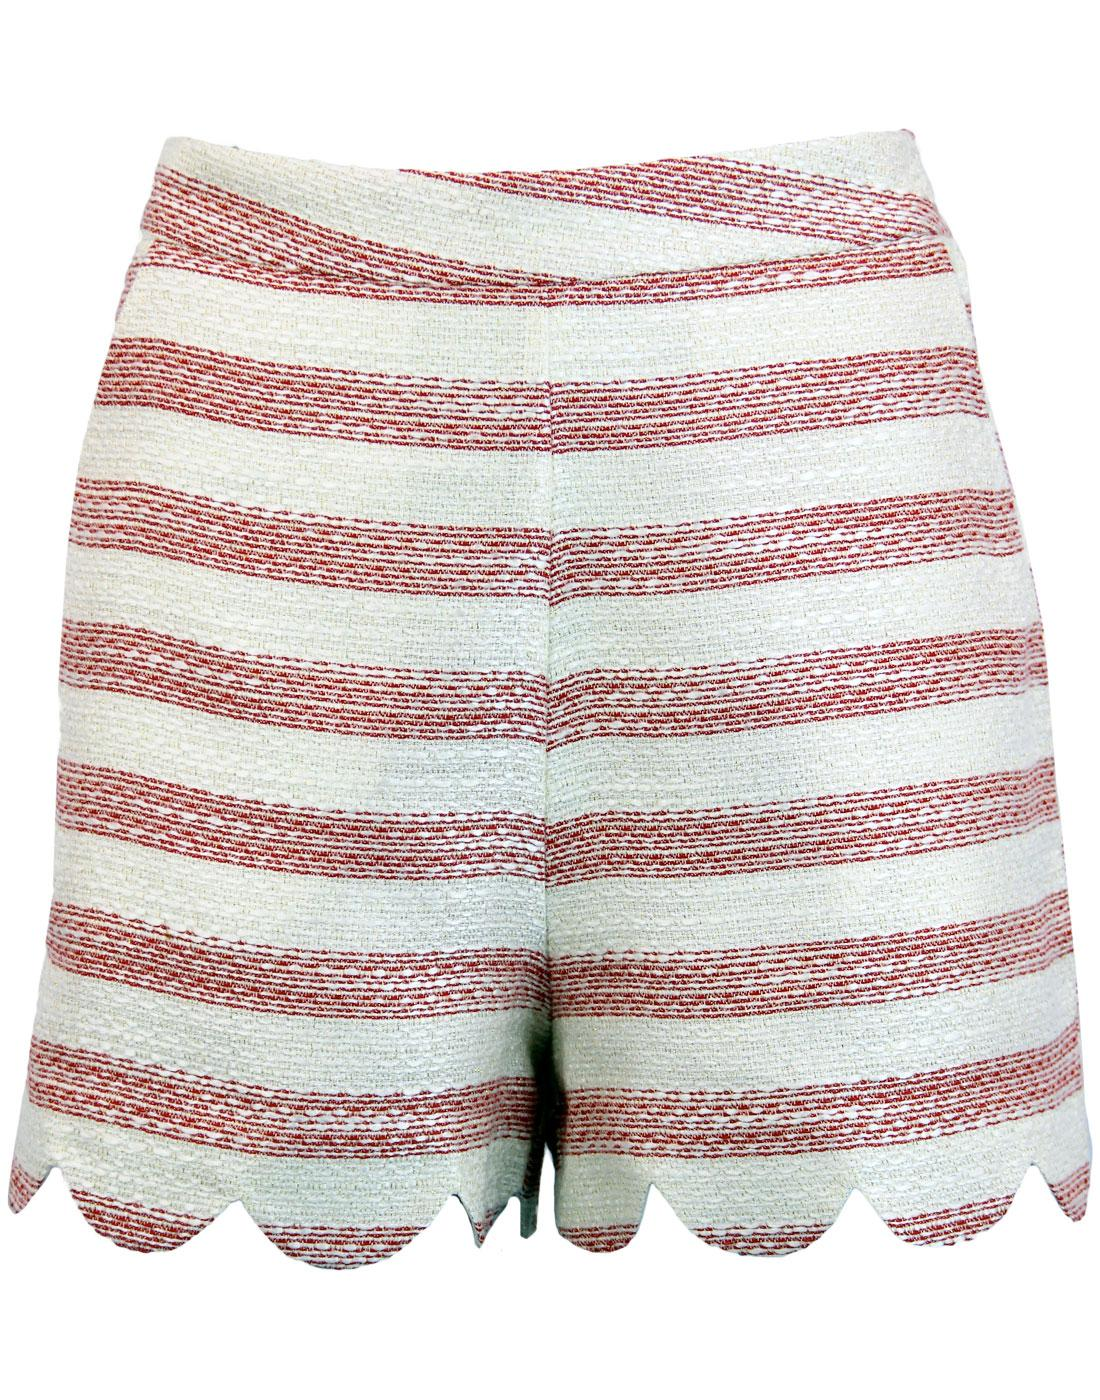 TRAFFIC PEOPLE Retro 1960s Striped Scallop Shorts